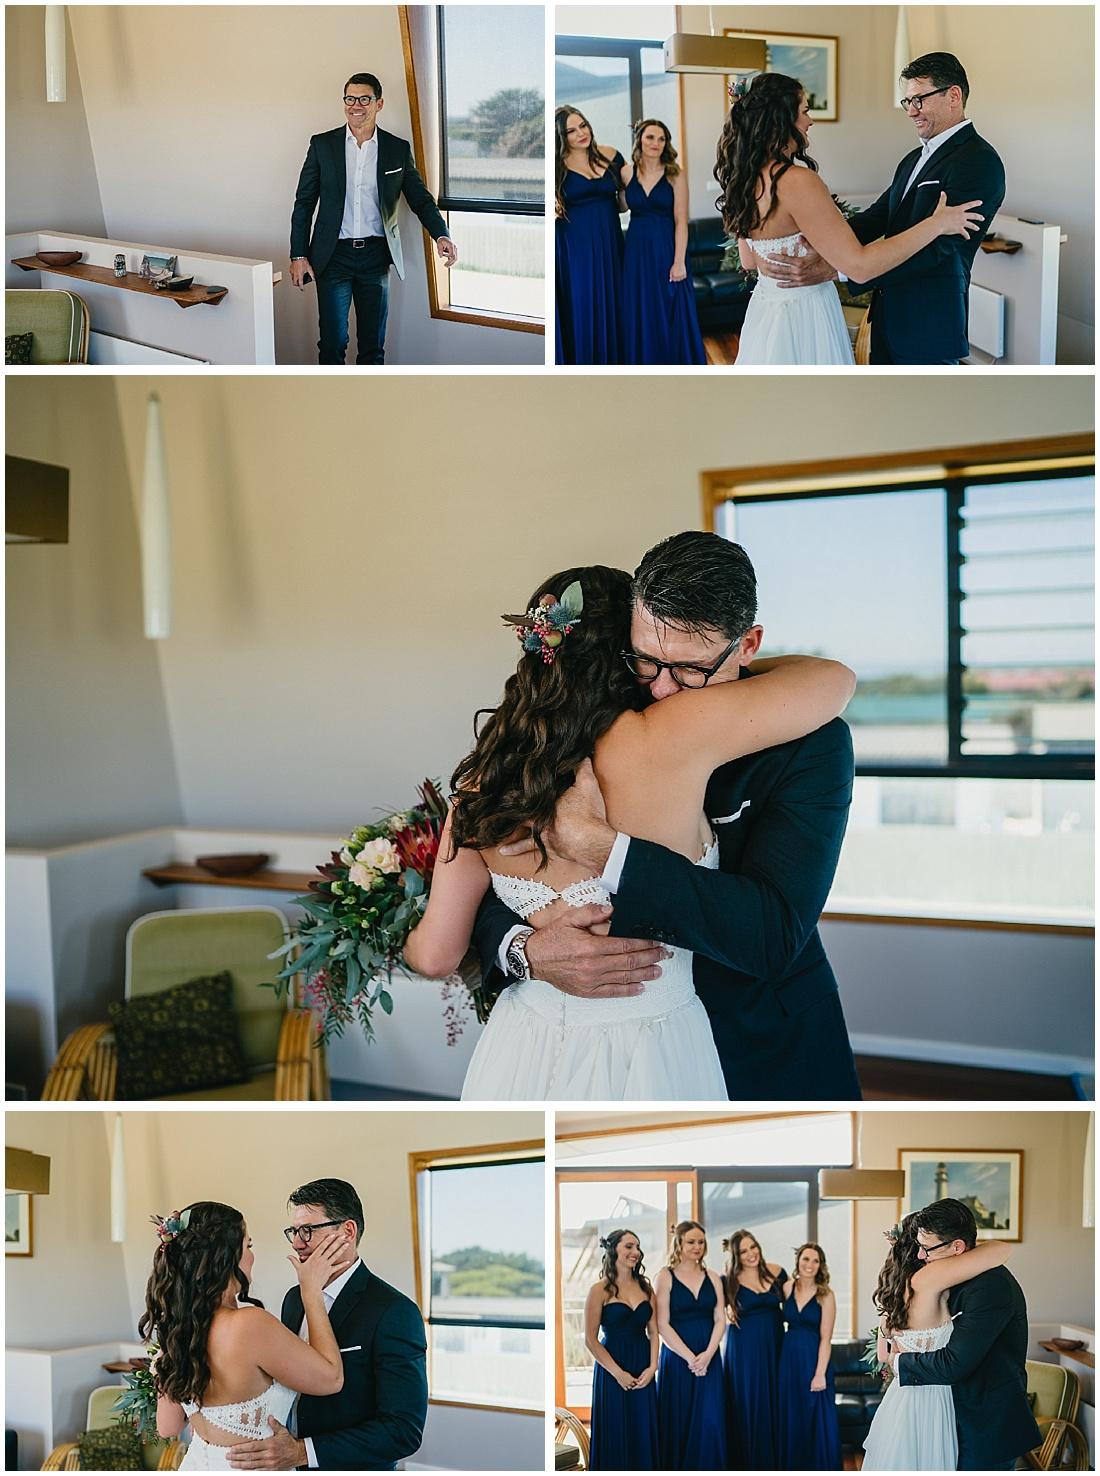 phillip island melbourne wedding photography_0003.jpg